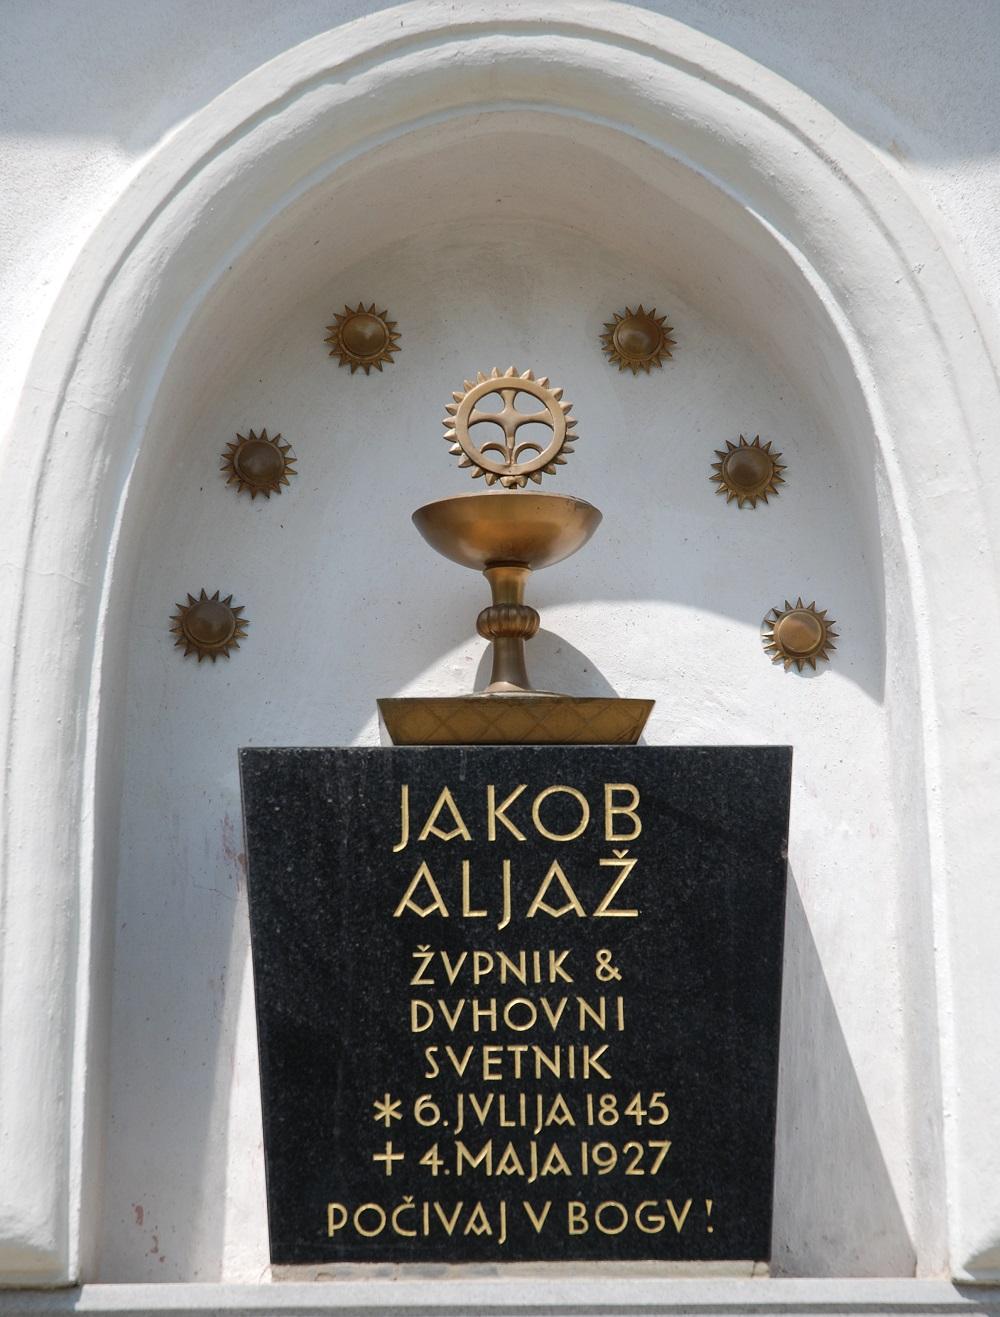 JAKOB ALJAŽ